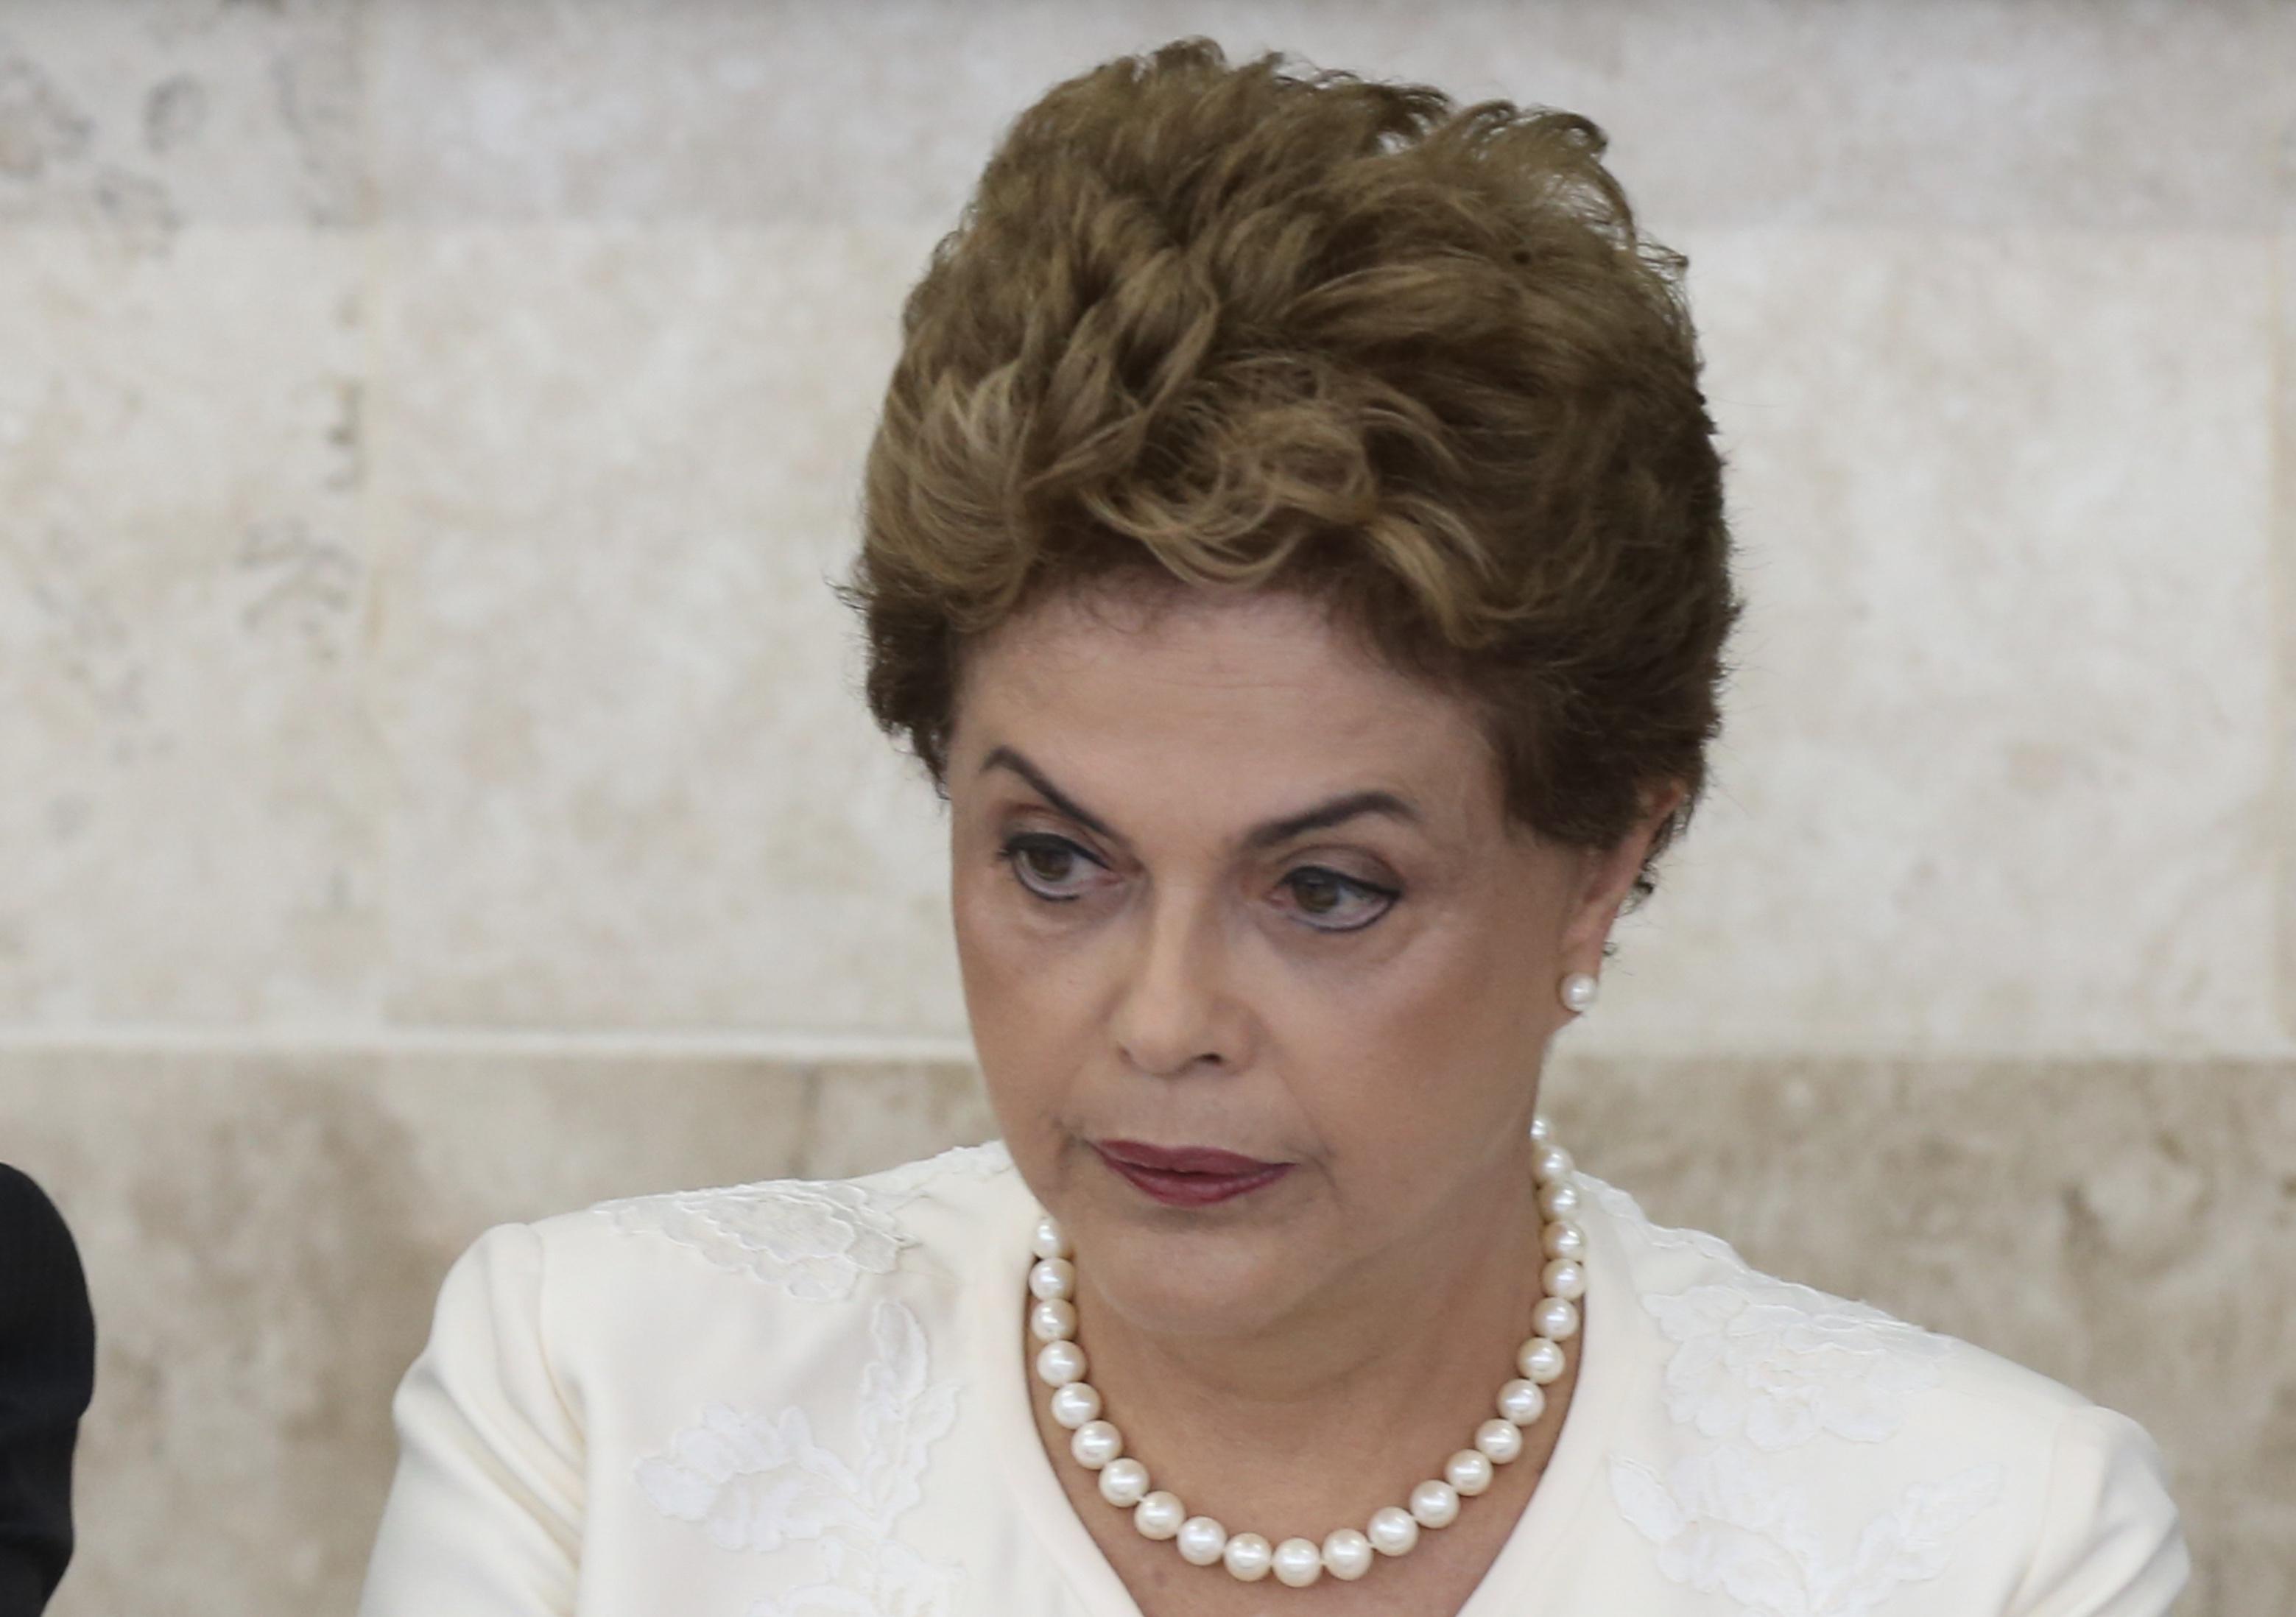 DilmaRousseff-Foto-LulaMarques-AgenciaPT-28jan2106